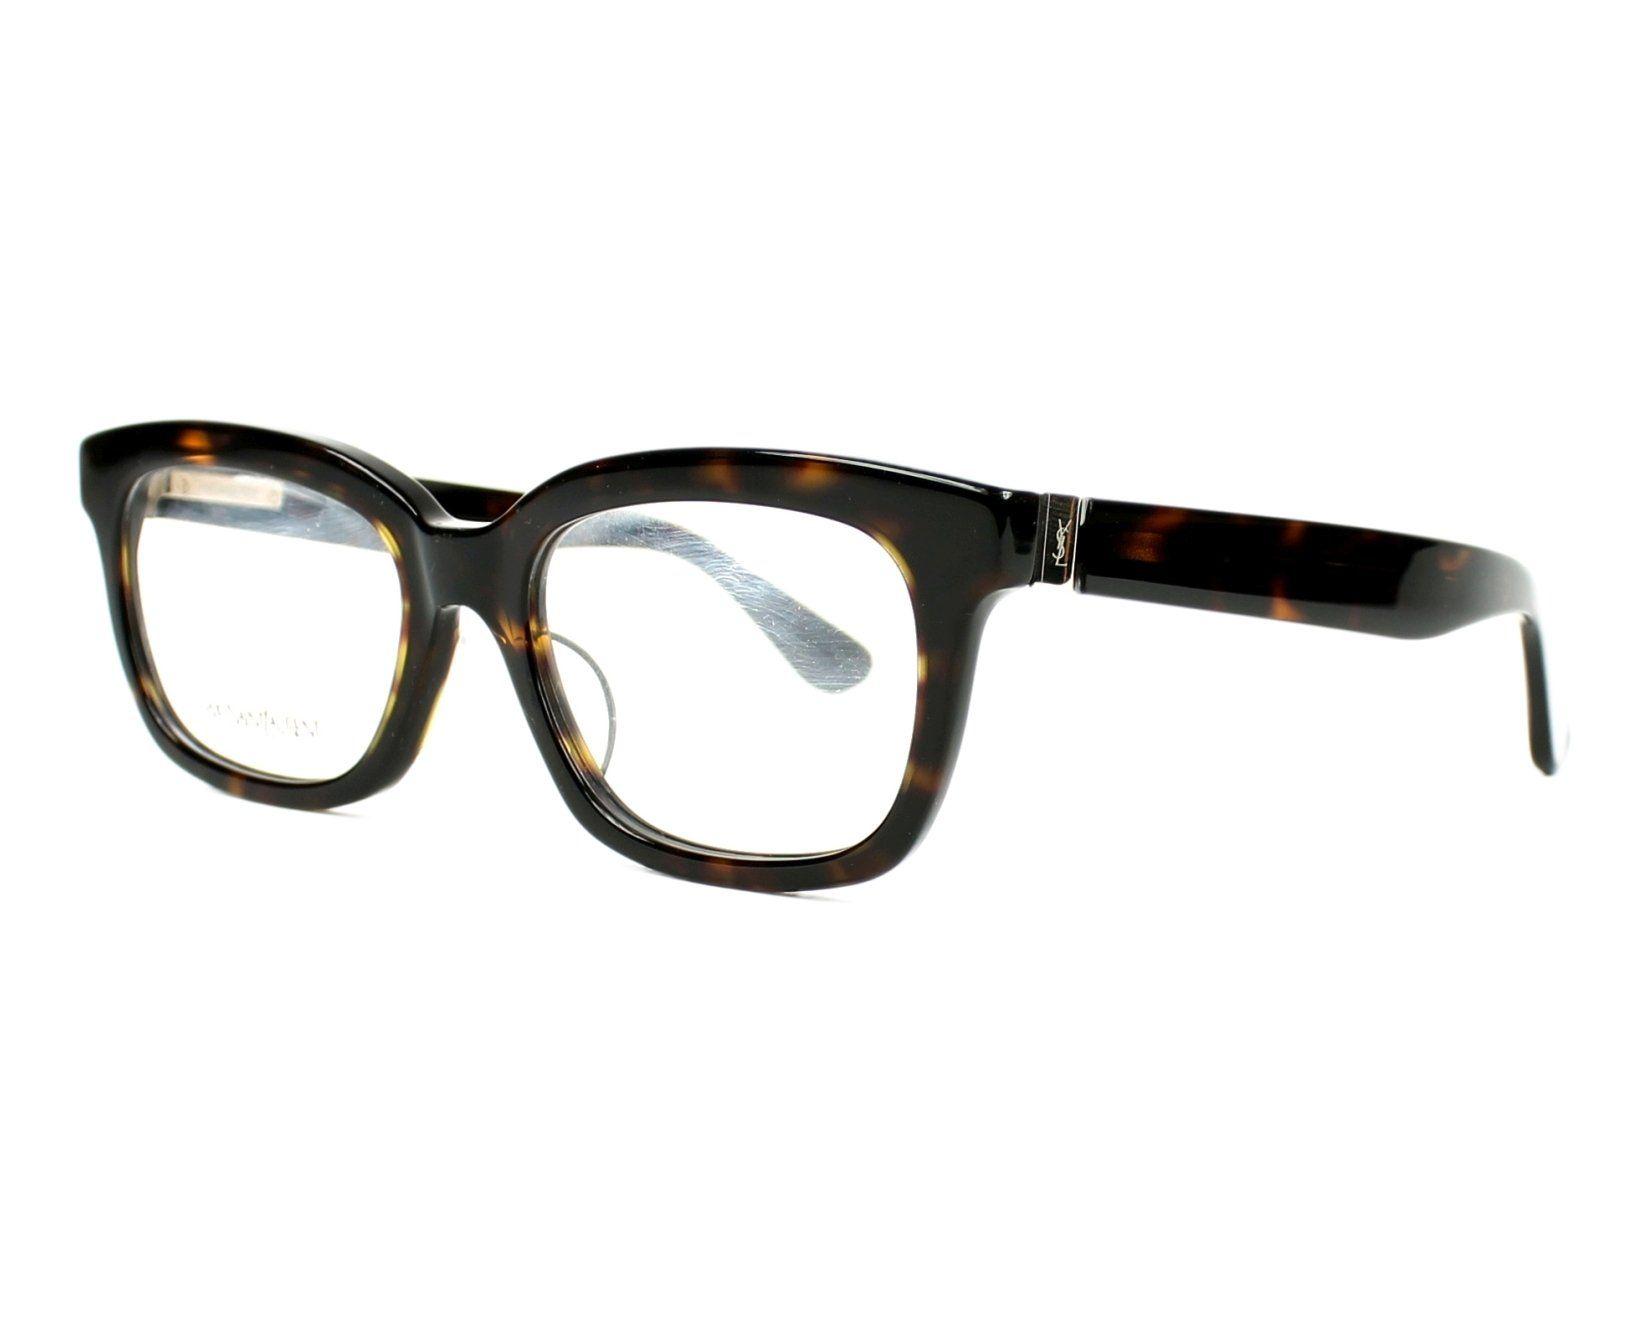 Yves Saint Laurent Brille YSL4030J 086 53   Visionet   eye style ...